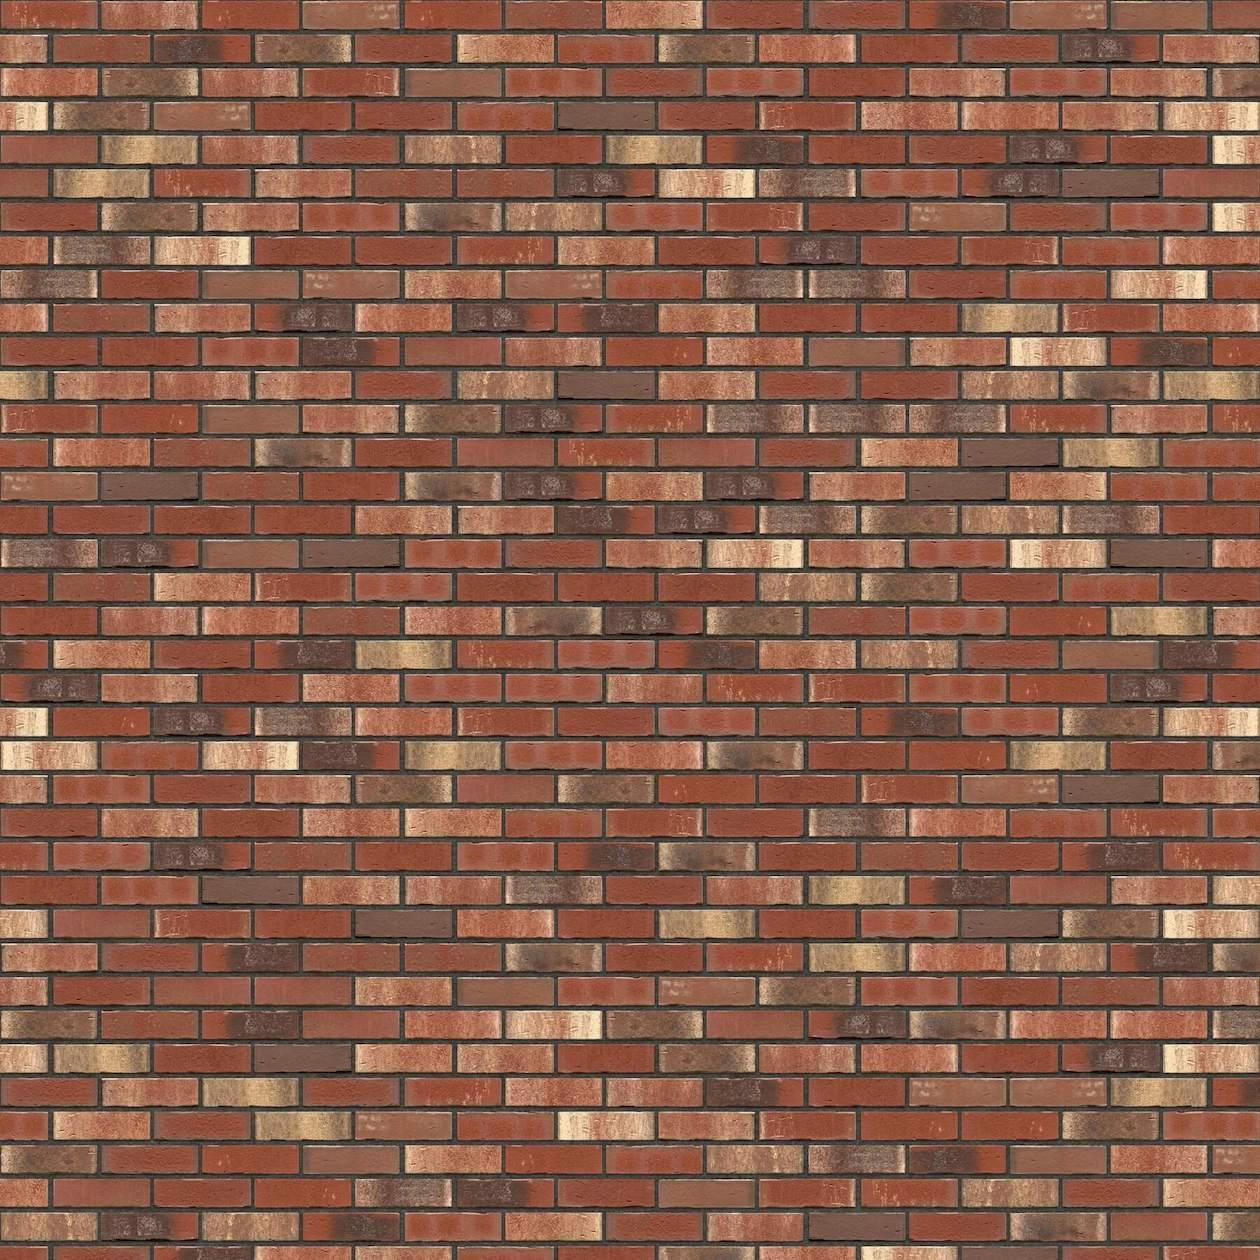 Puna-cigla-FeldHaus-Klinker-brick-house-nf-k-750-Antracit Fuga